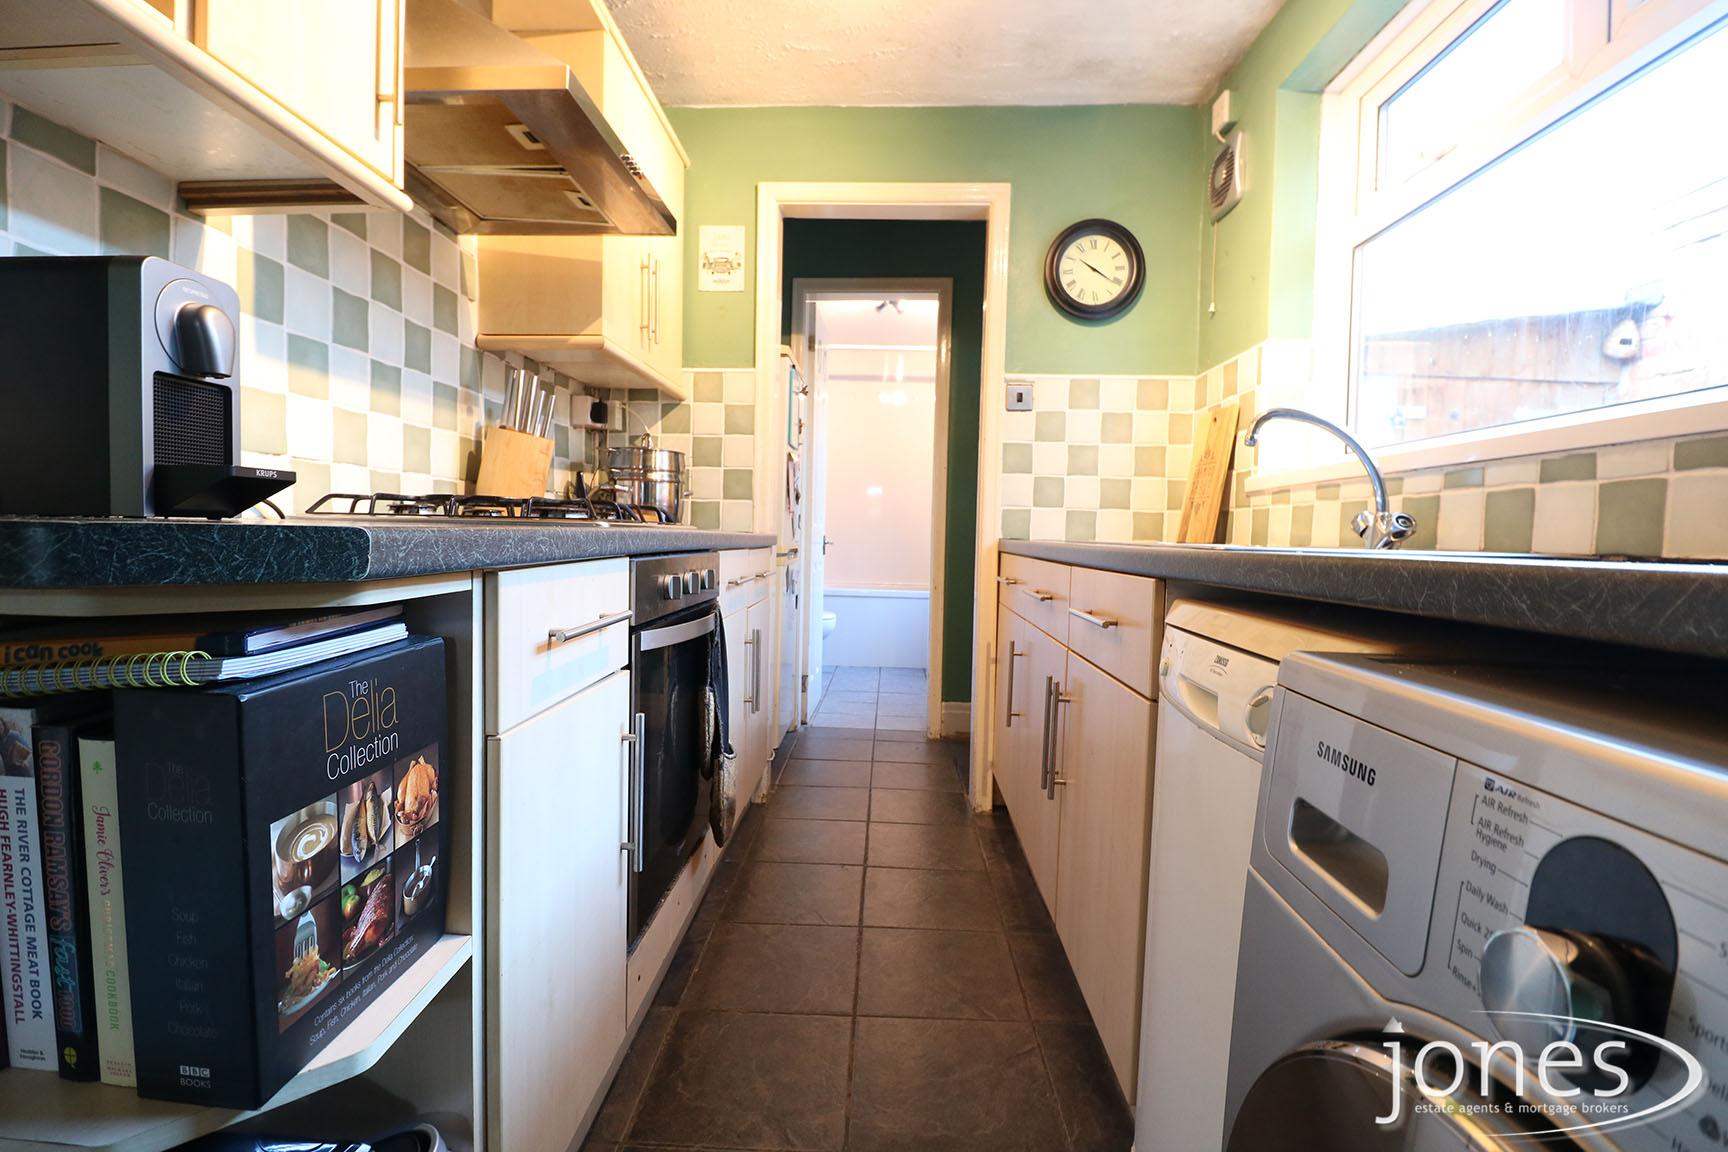 Home for Sale Let - Photo 03 North Mount Pleasant Street, Norton, Stockton on Tees, TS20 2JA